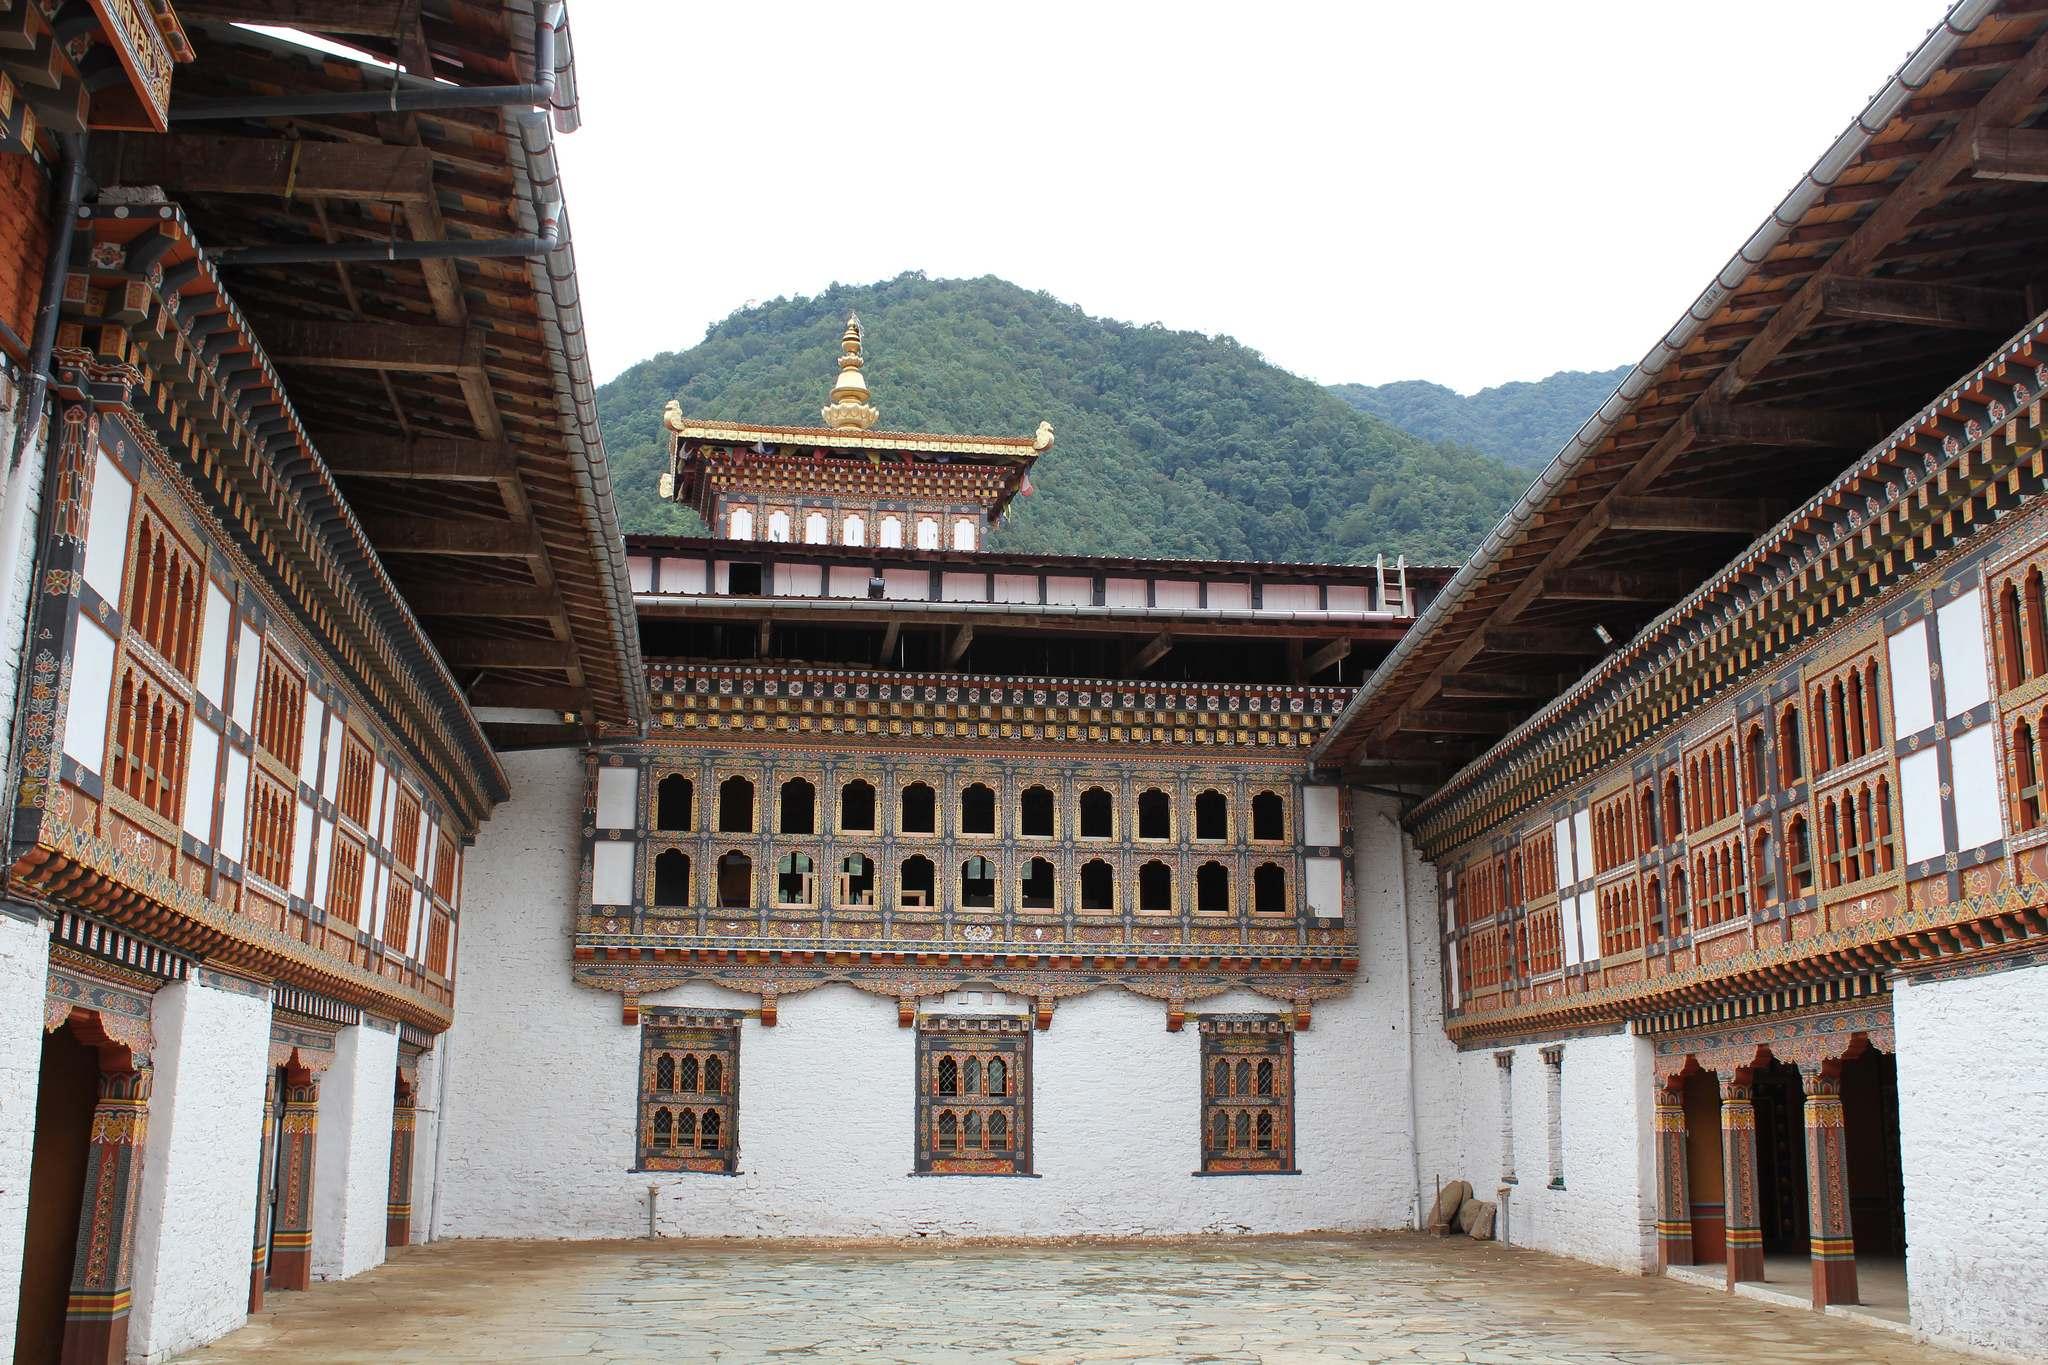 bhutan12 Bhutan   The Land of the Thunder Dragon